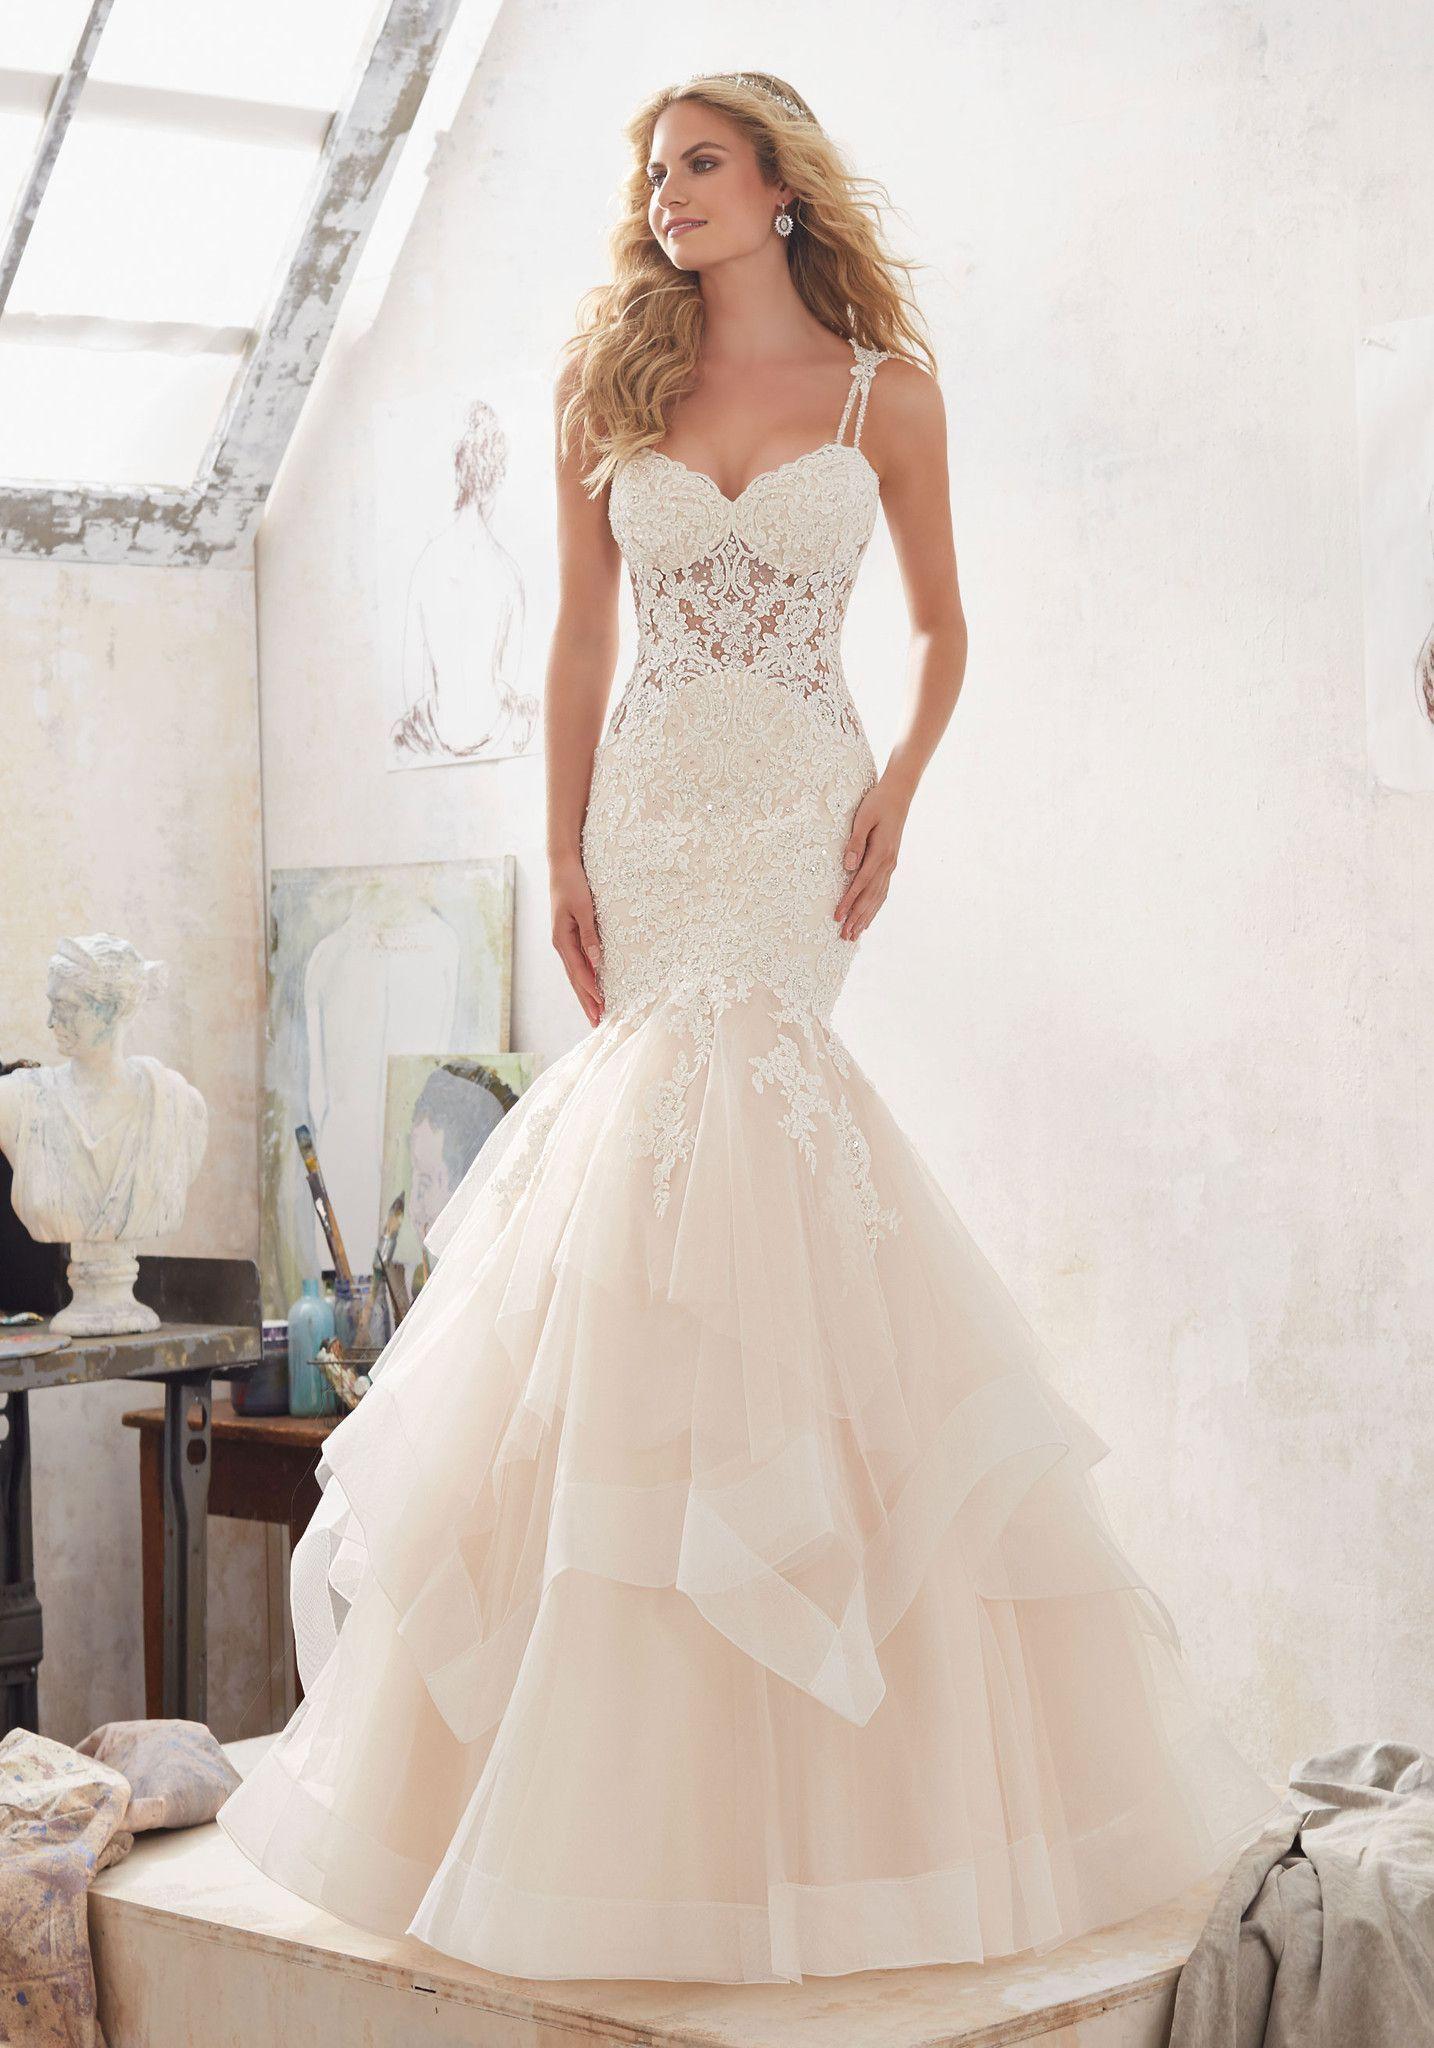 Mori lee marciela all dressed up bridal gown wedding